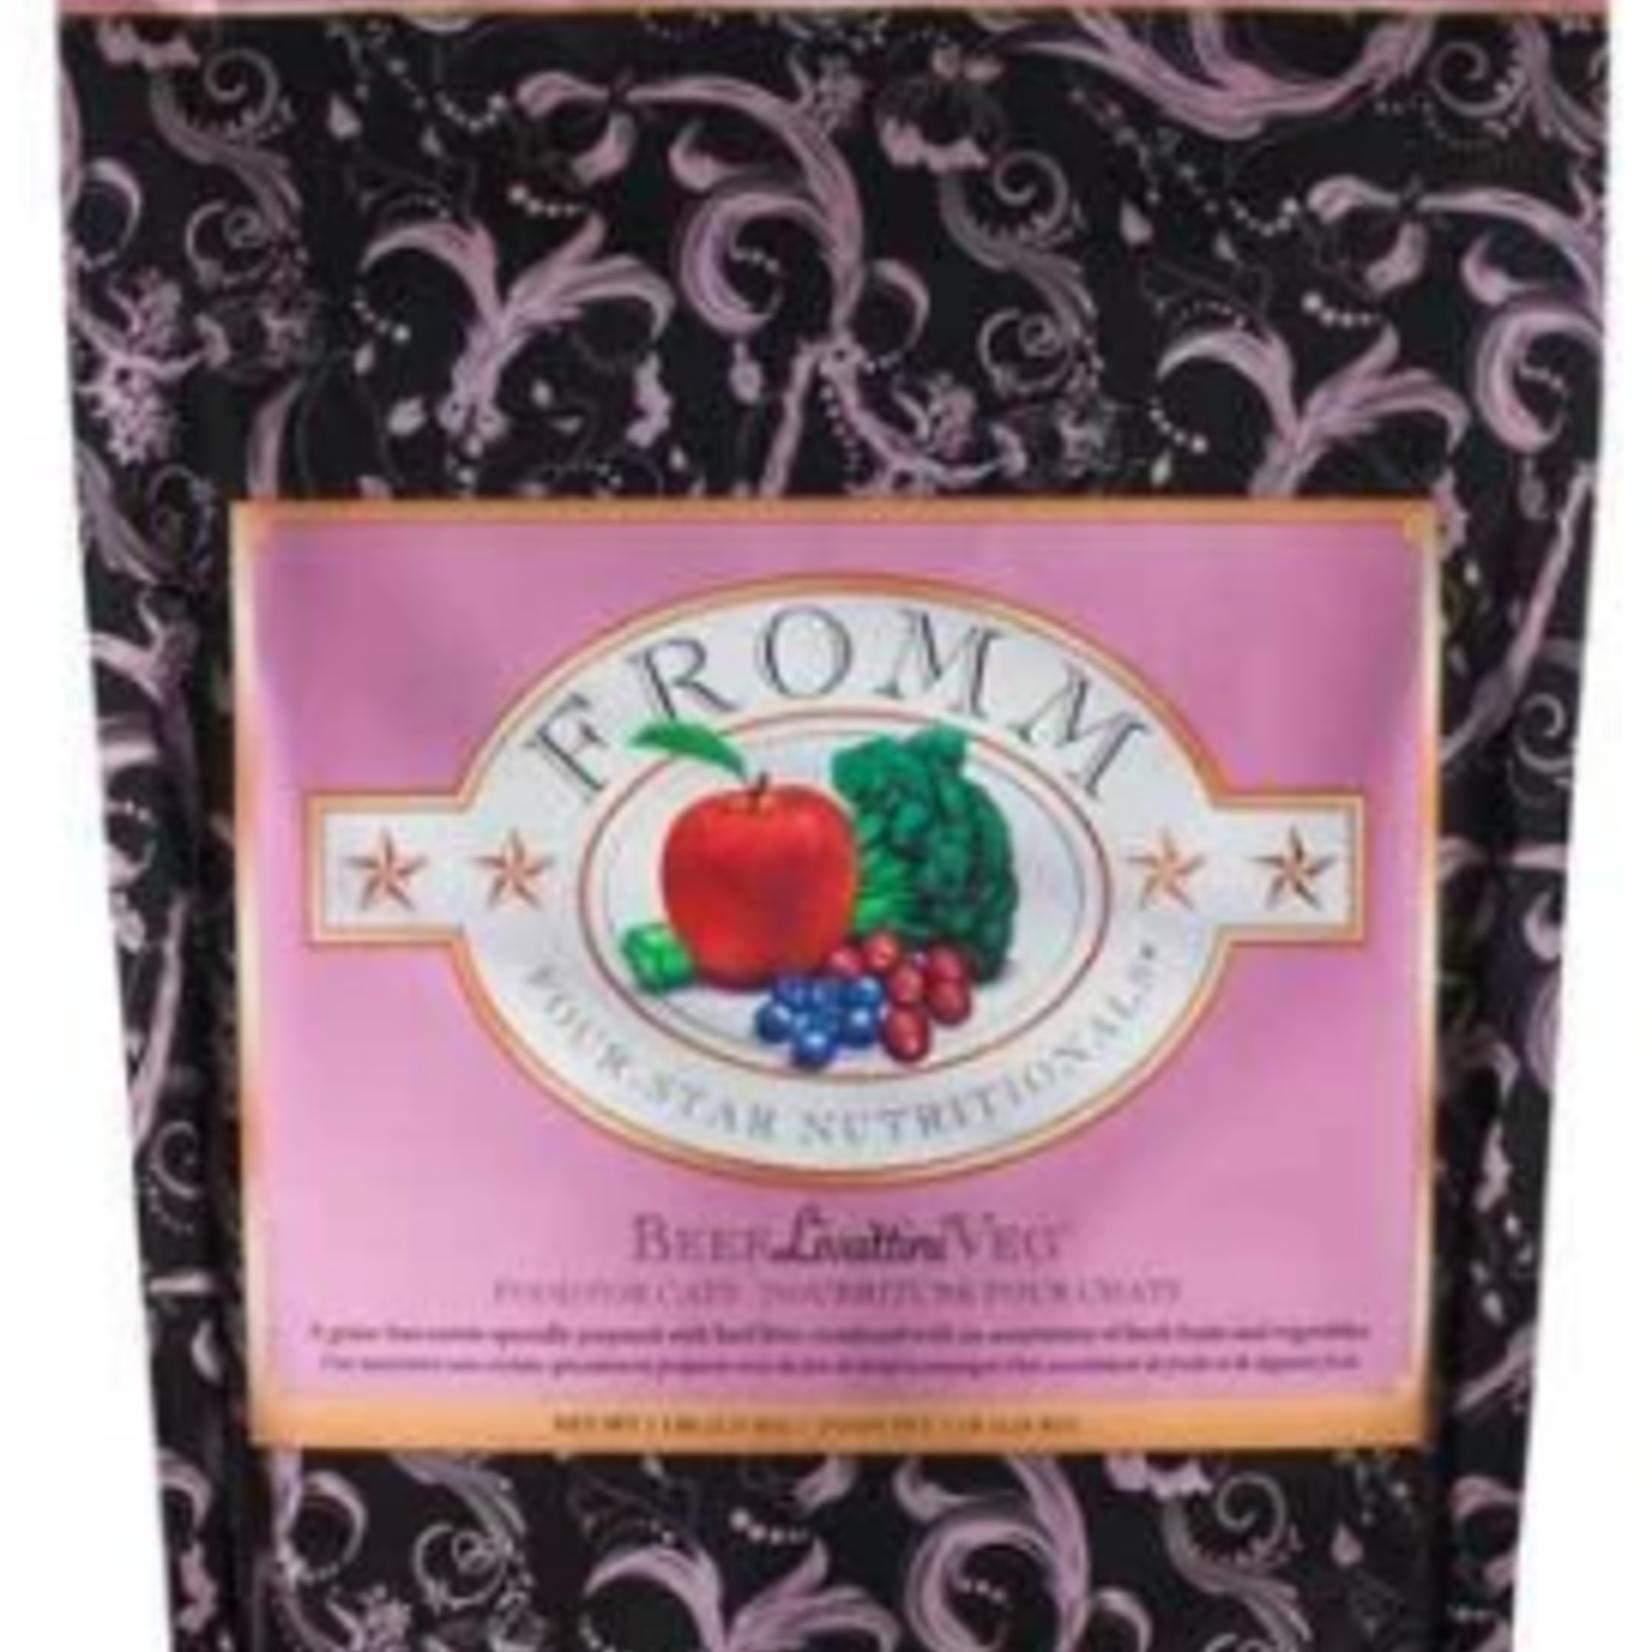 Fromm Beef Liváttini Veg® Recipe -  dry cat food